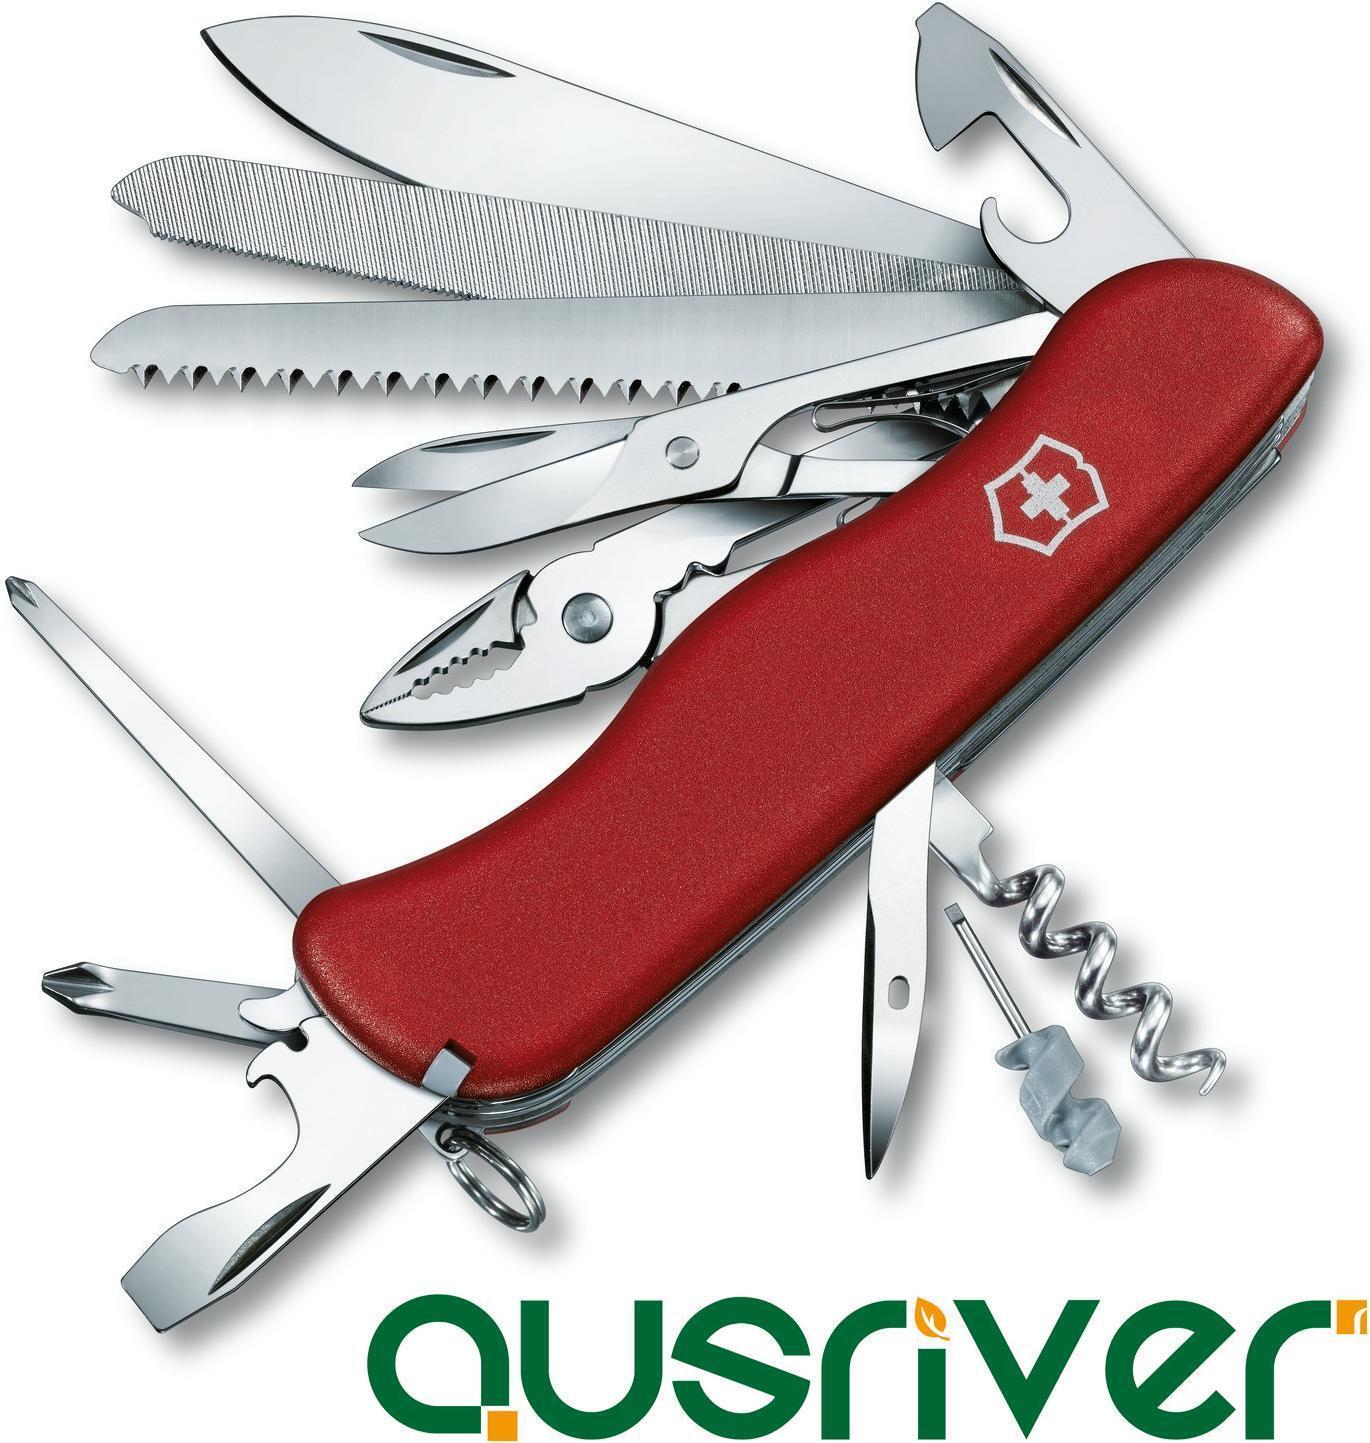 Victorinox Swiss Army Knife 20 En 1 Workchamp 0.9064 111mm Cortar Taladro Sierra Tornillo